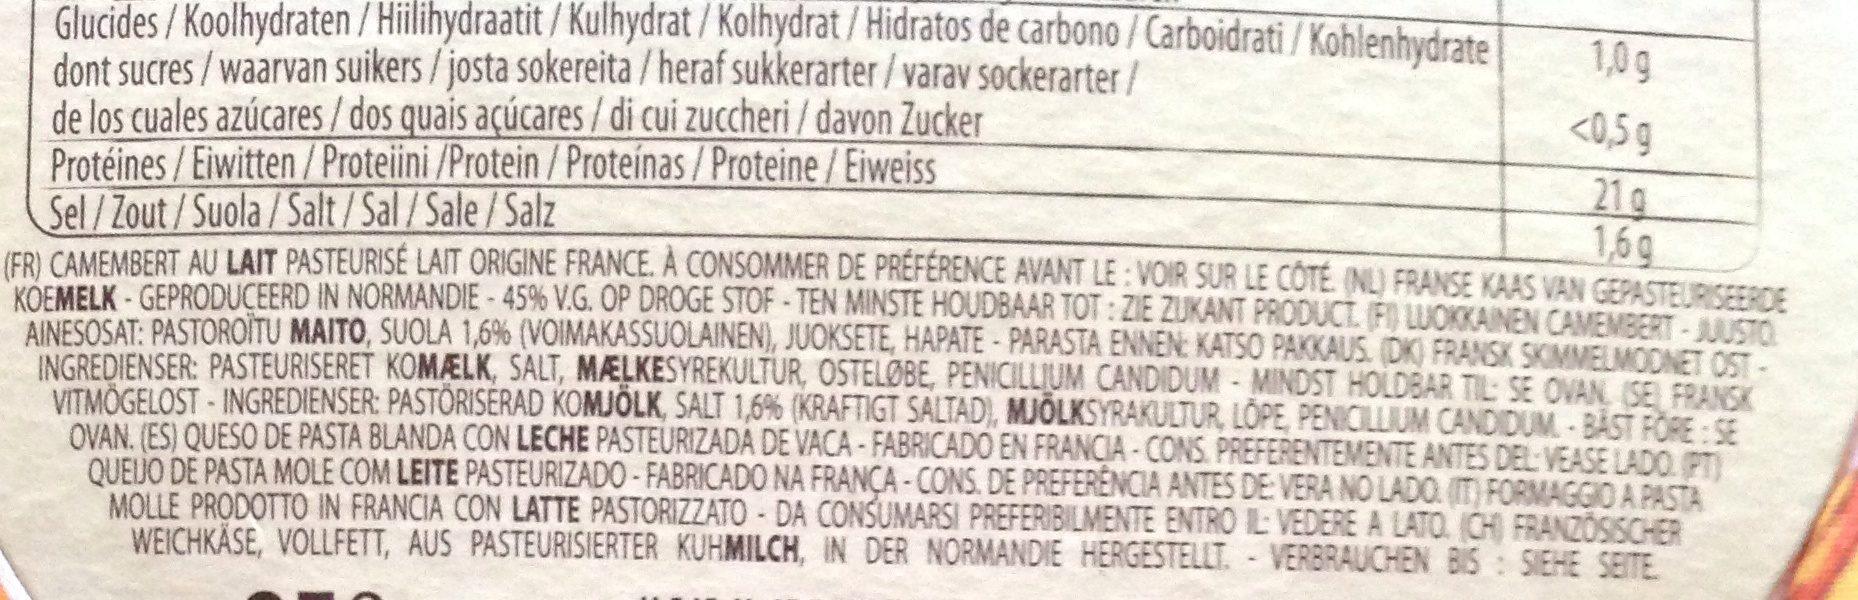 Camembert Le Rustique de Printemps - Ingrediënten